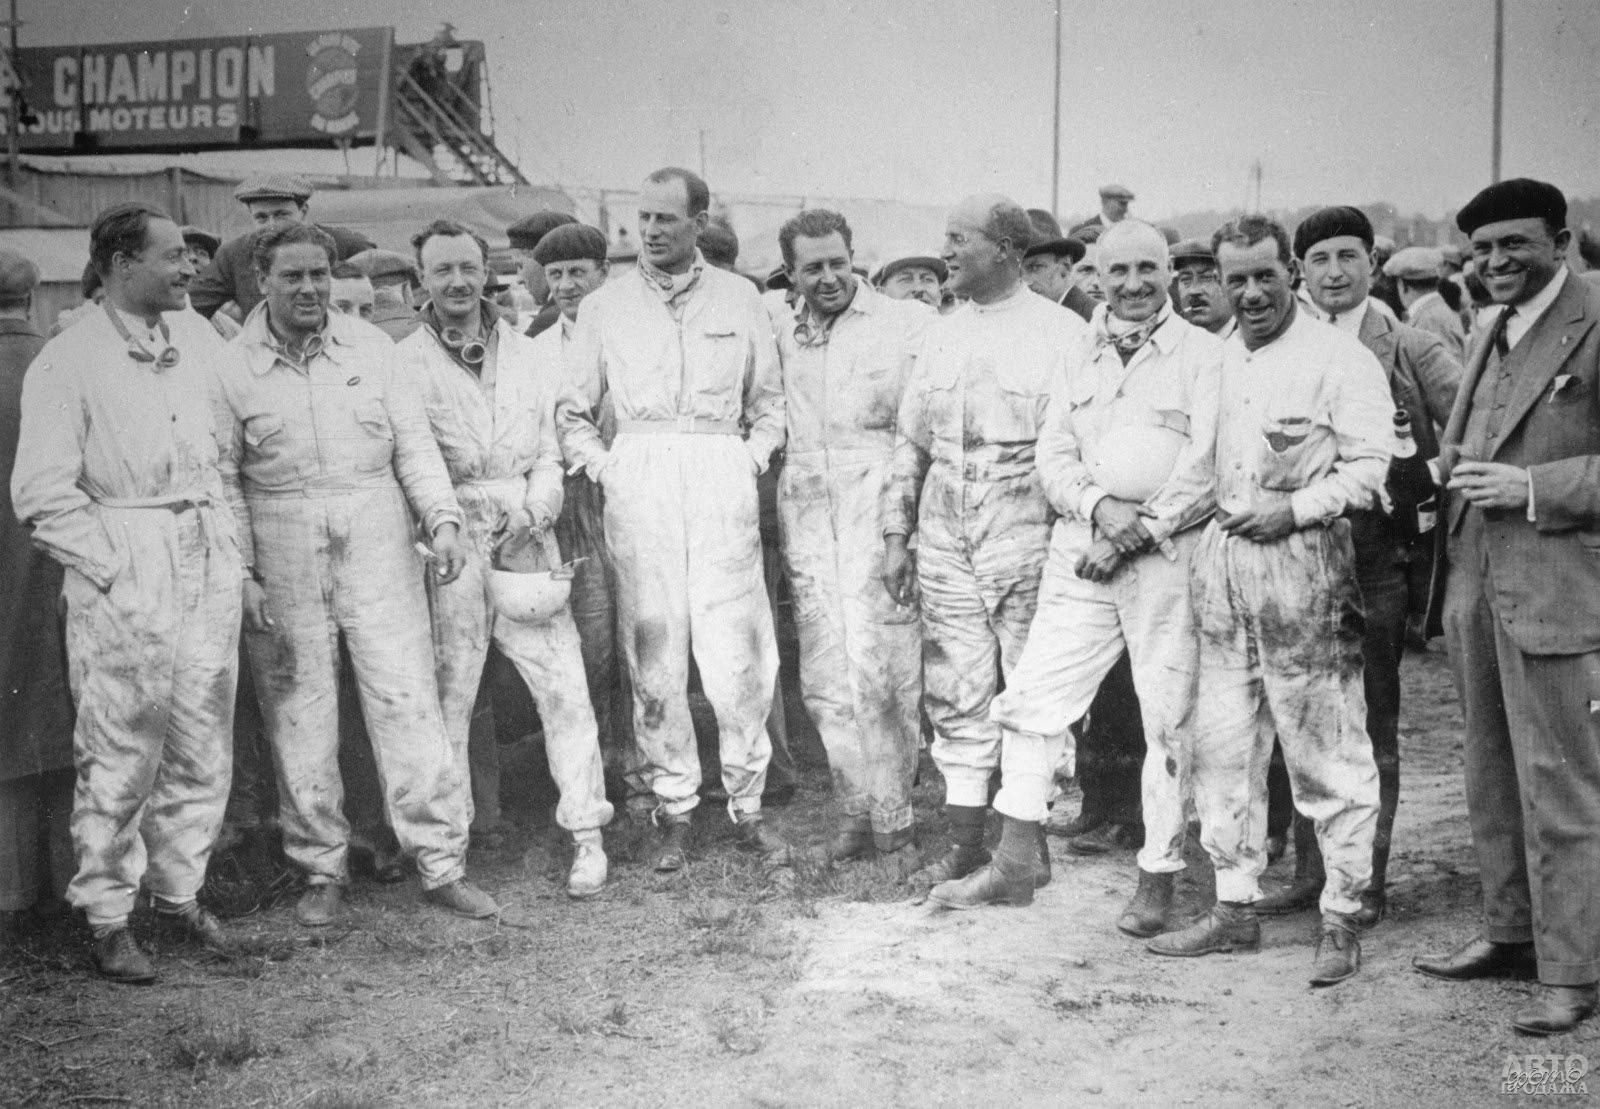 Bentley Boys – команда гонщиков-аристократов